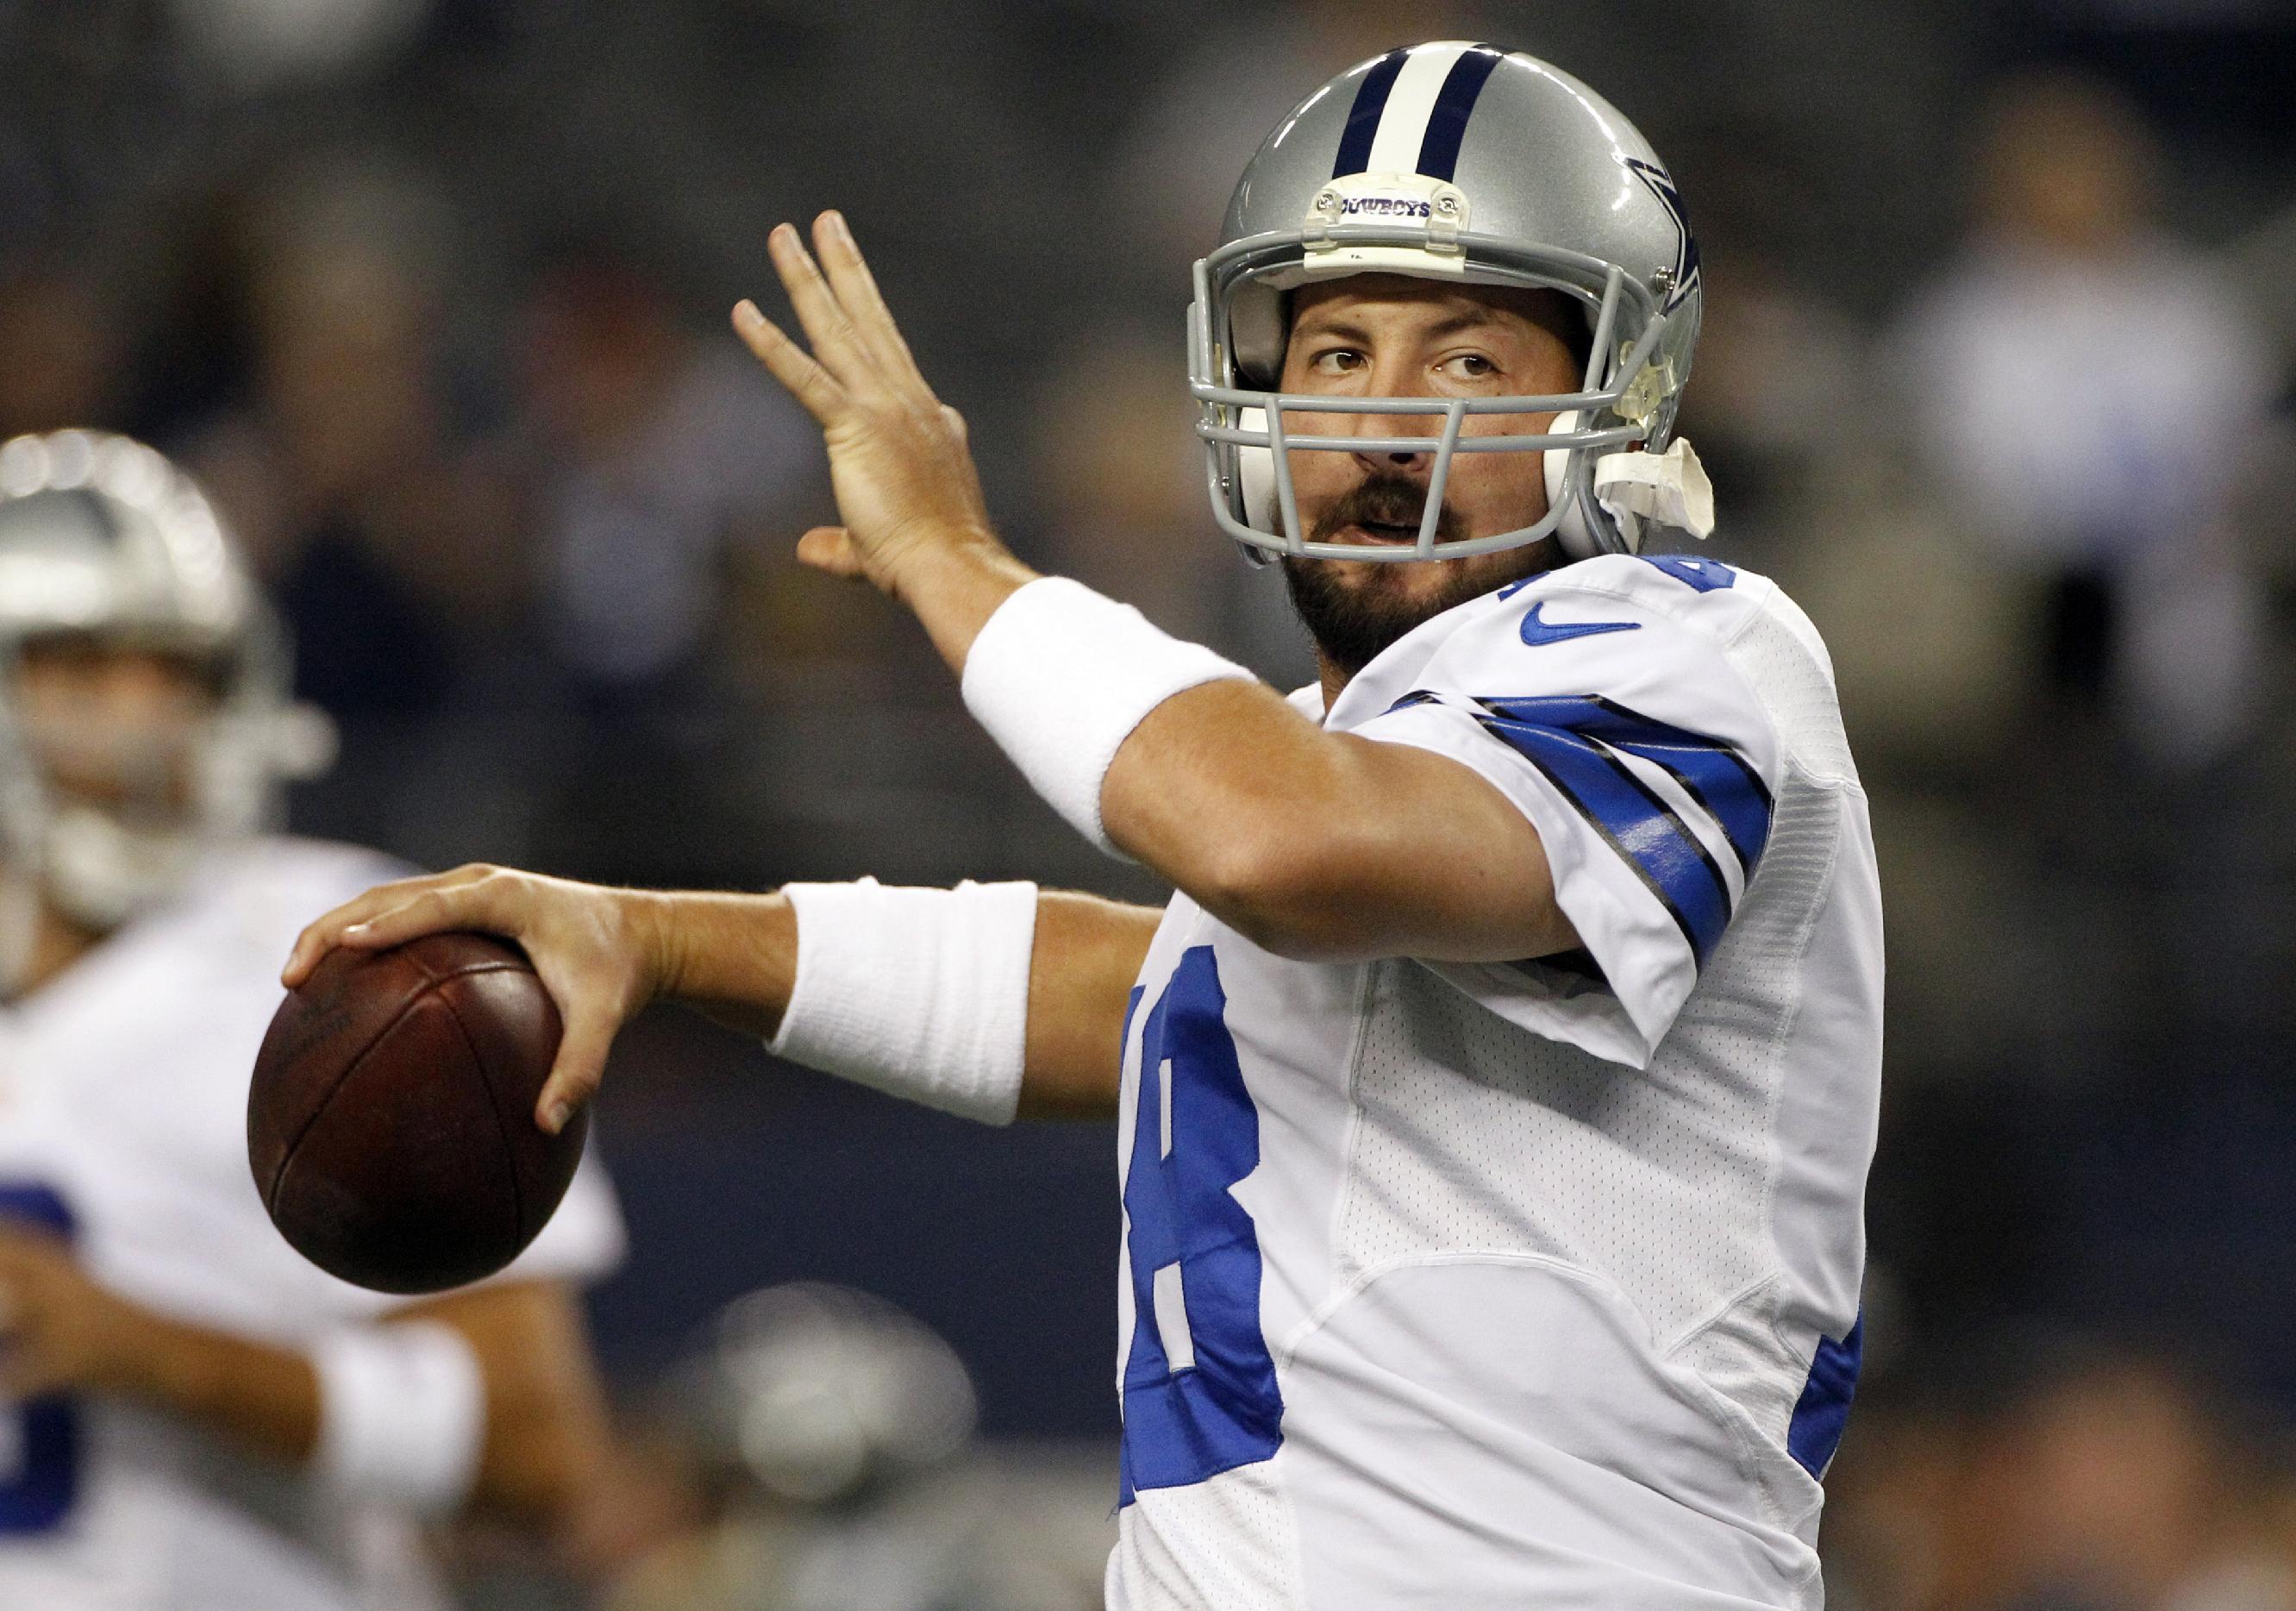 Dallas Cowboys release backup QB Kyle Orton